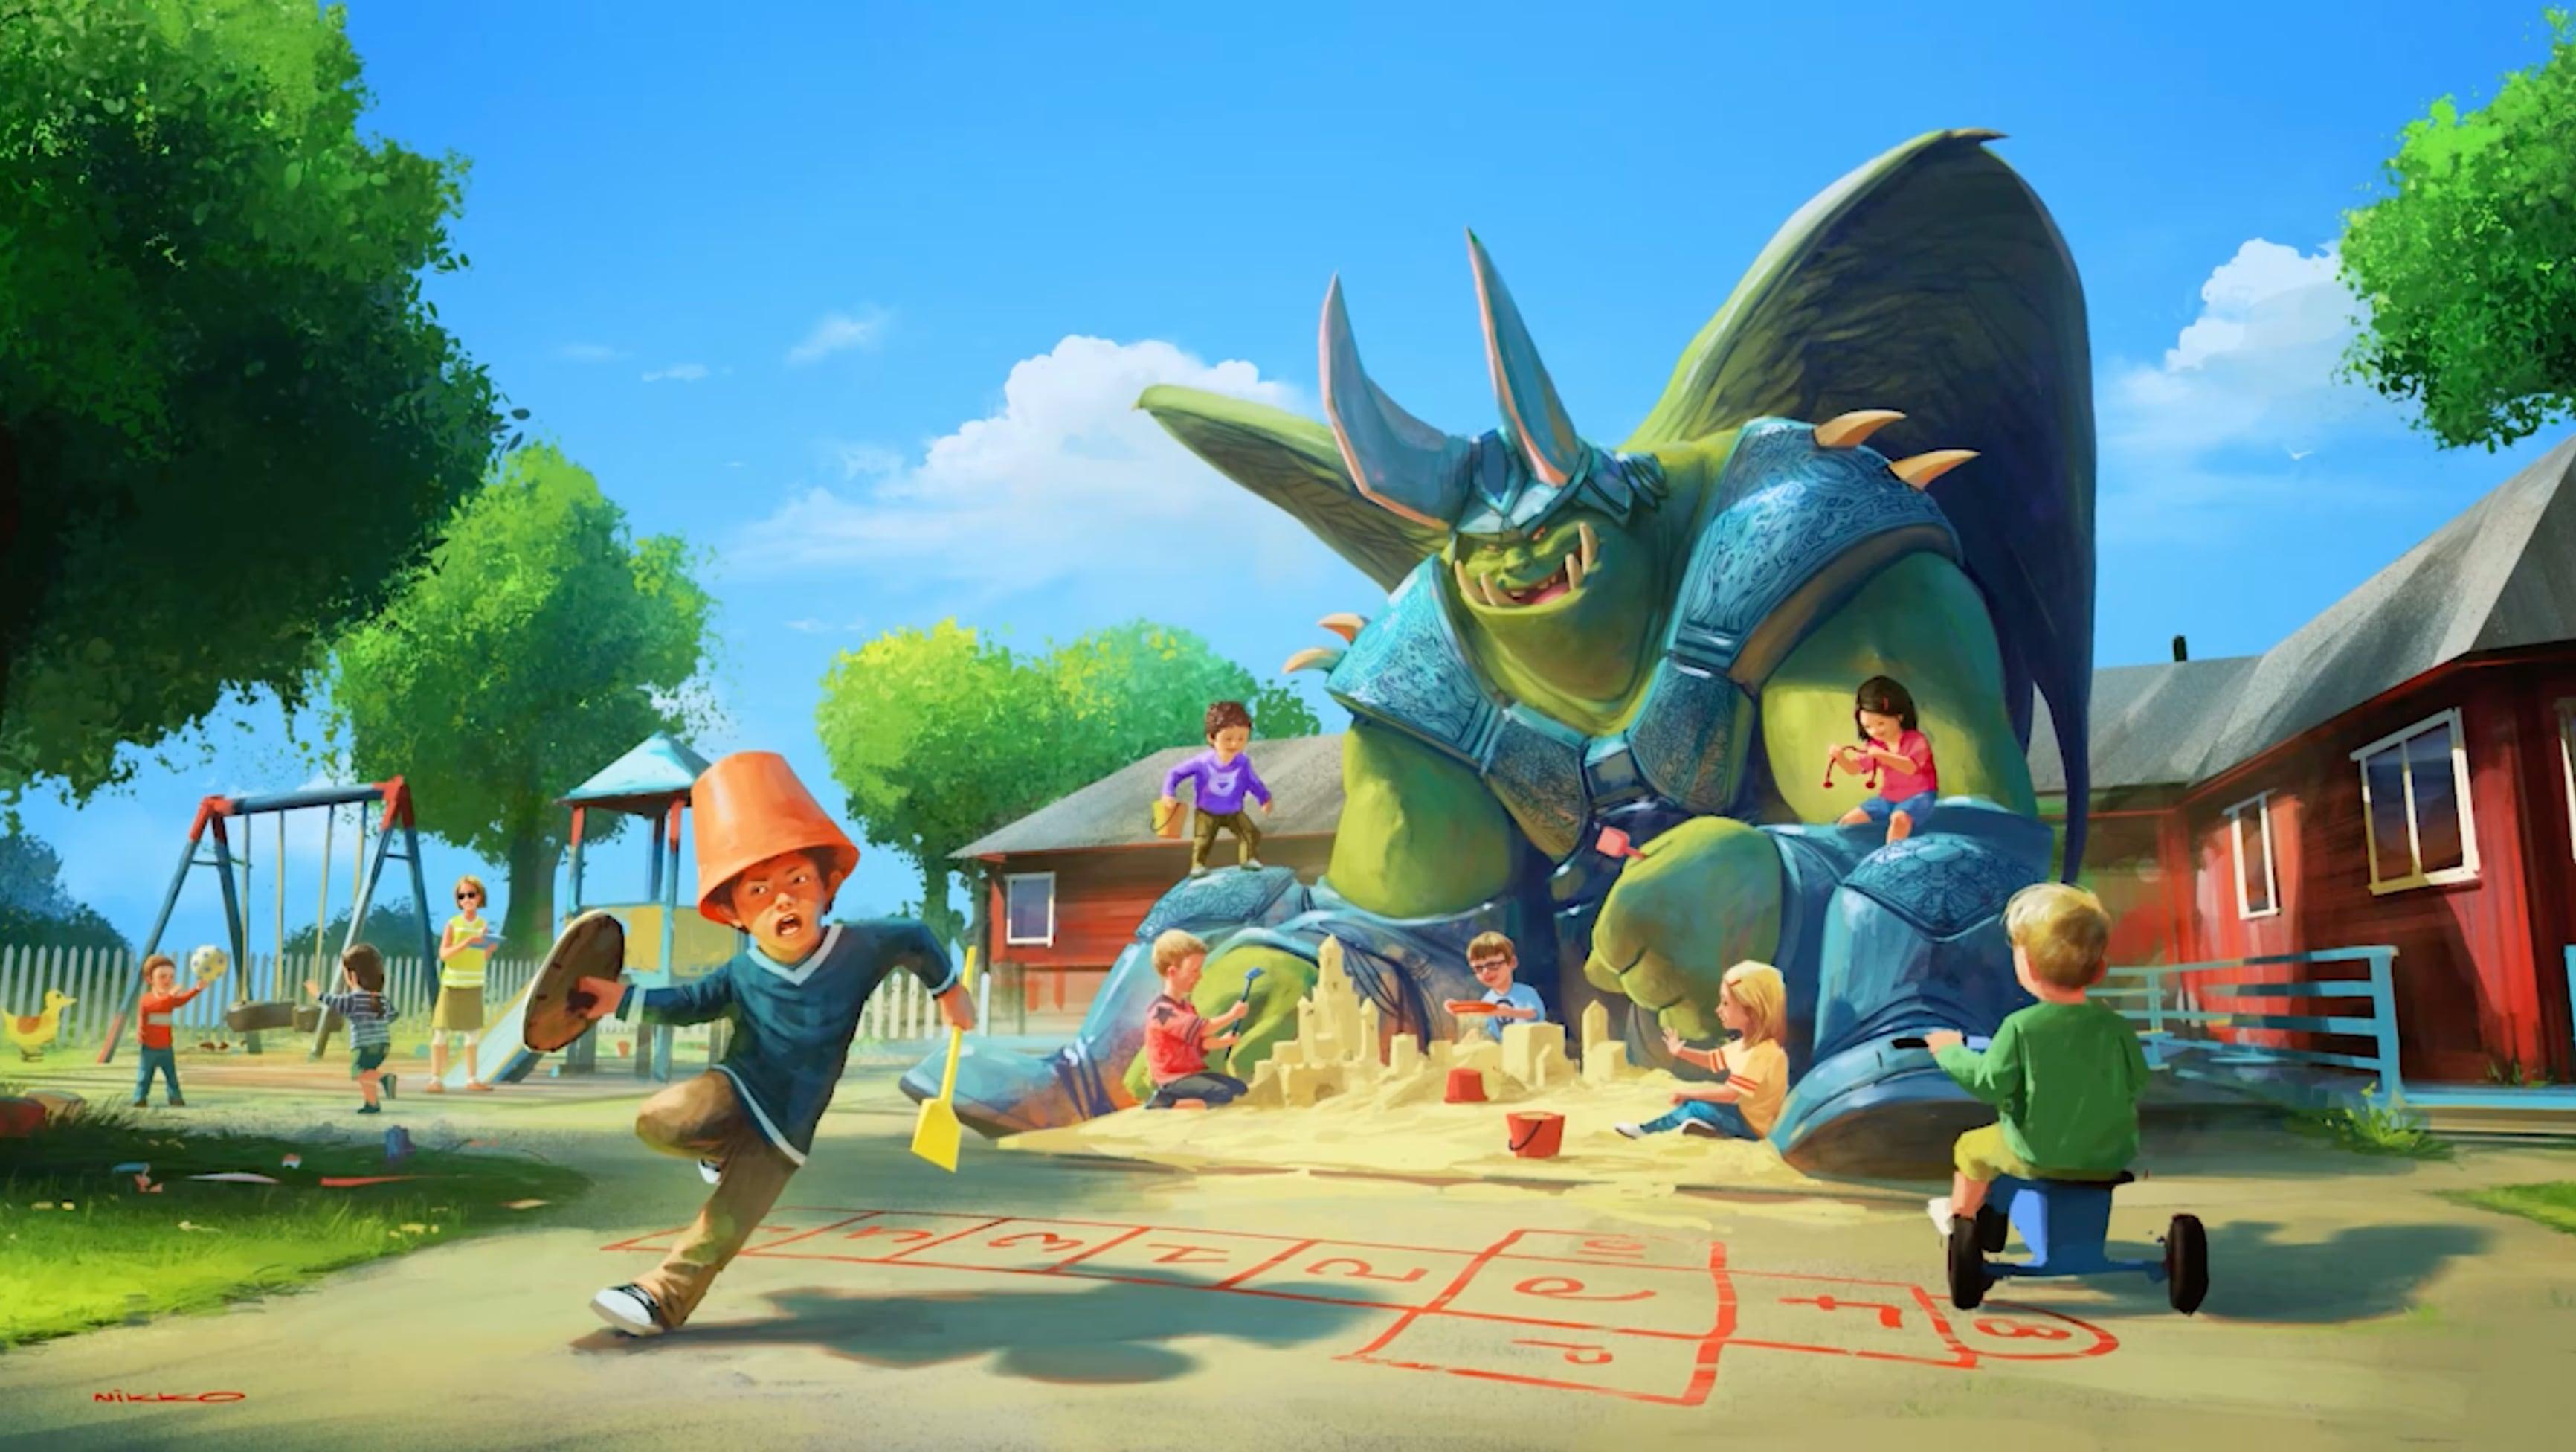 World of Warcraft Style Game